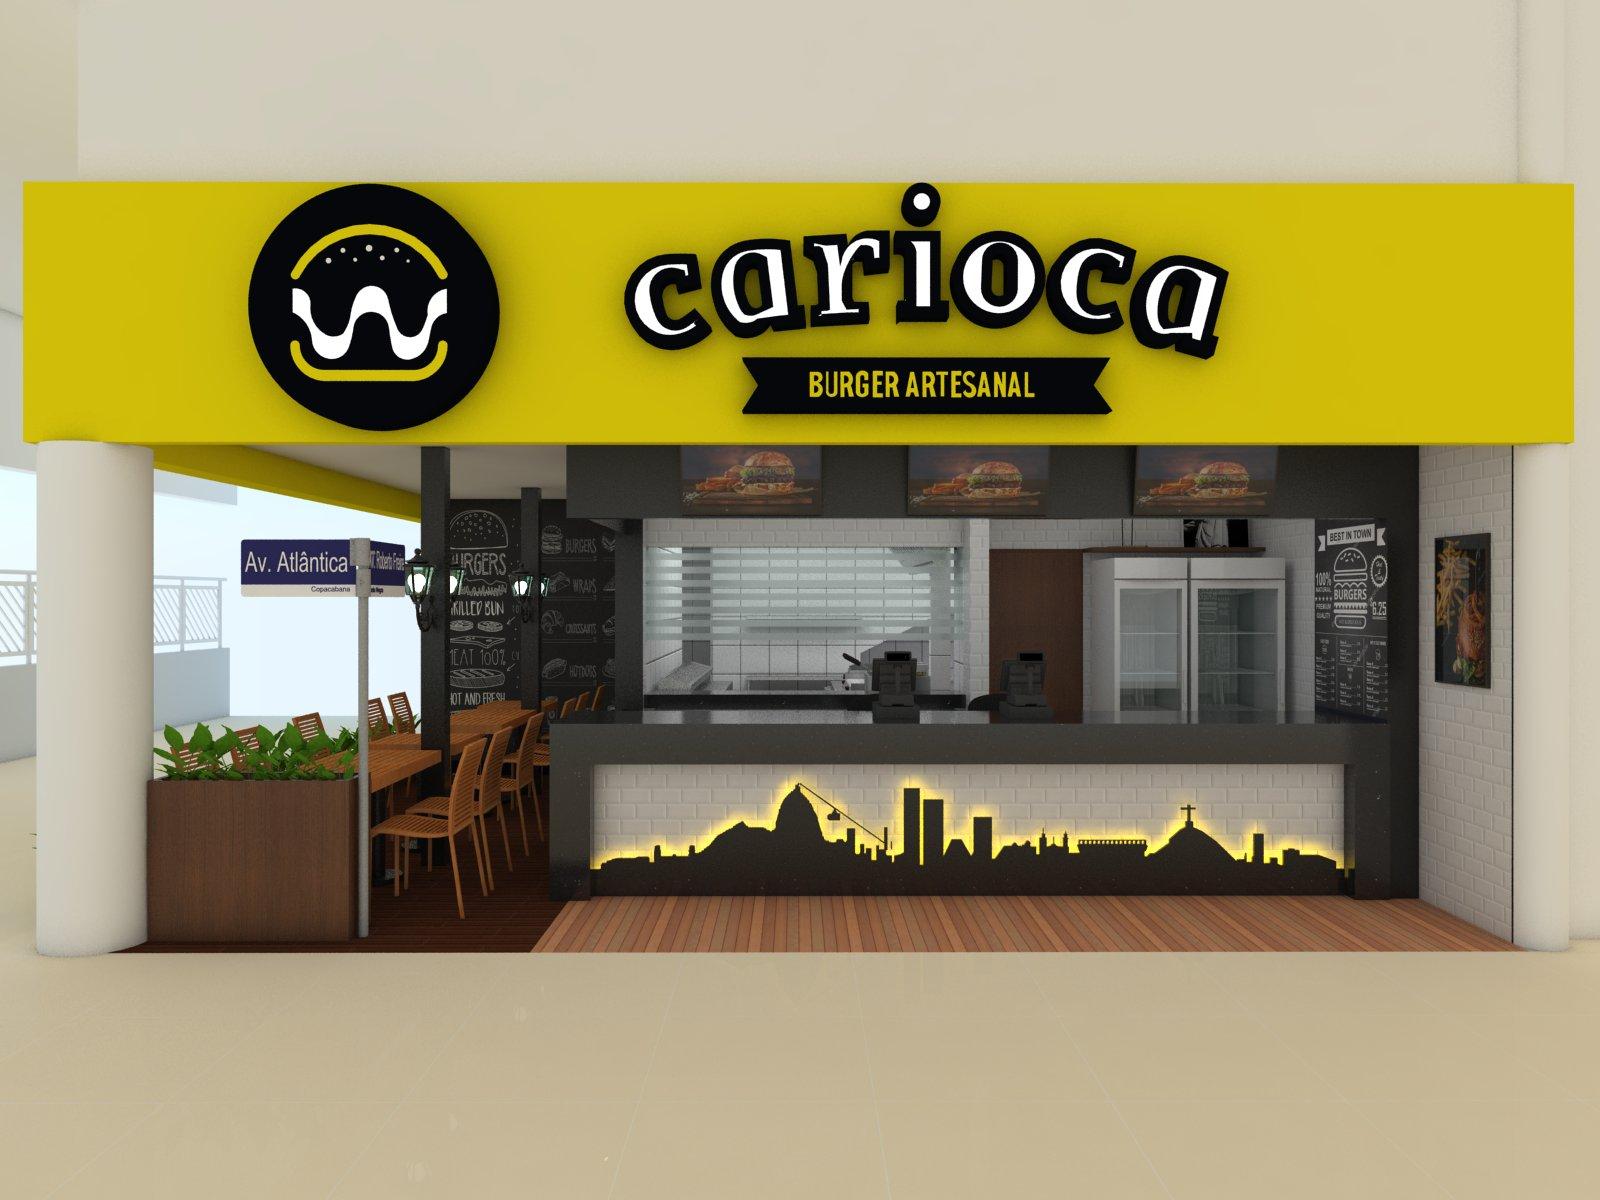 Carioca Burger Artesanal